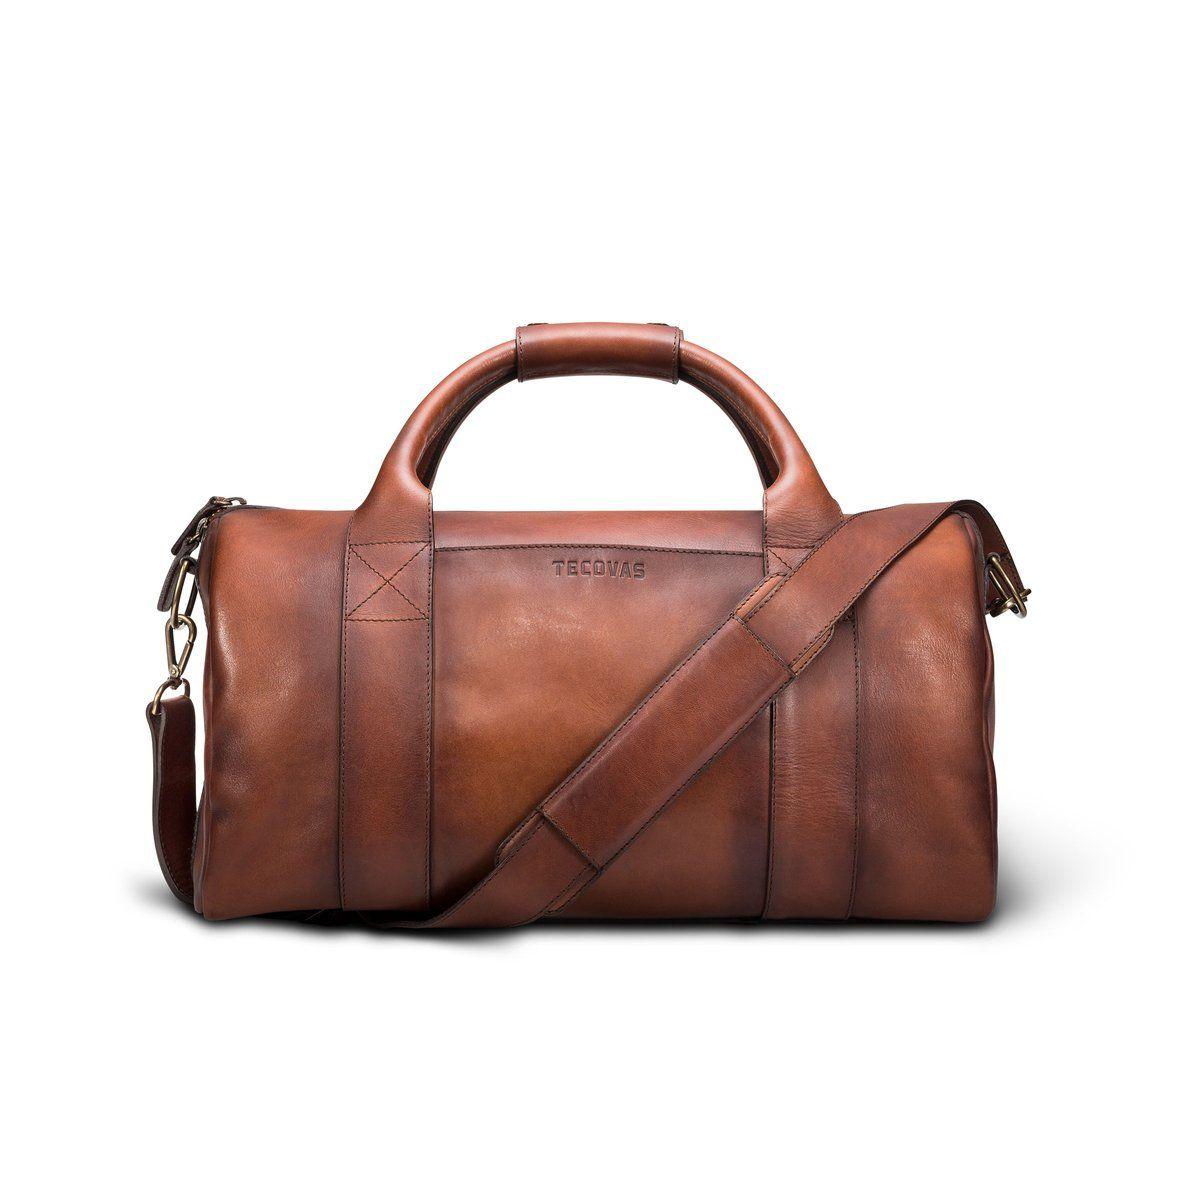 Polo Ralph Lauren Core Leather Duffle Bag Reviews Bags Backpacks Men Macy S Leather Duffle Bag Leather Duffle Leather Weekender Bag